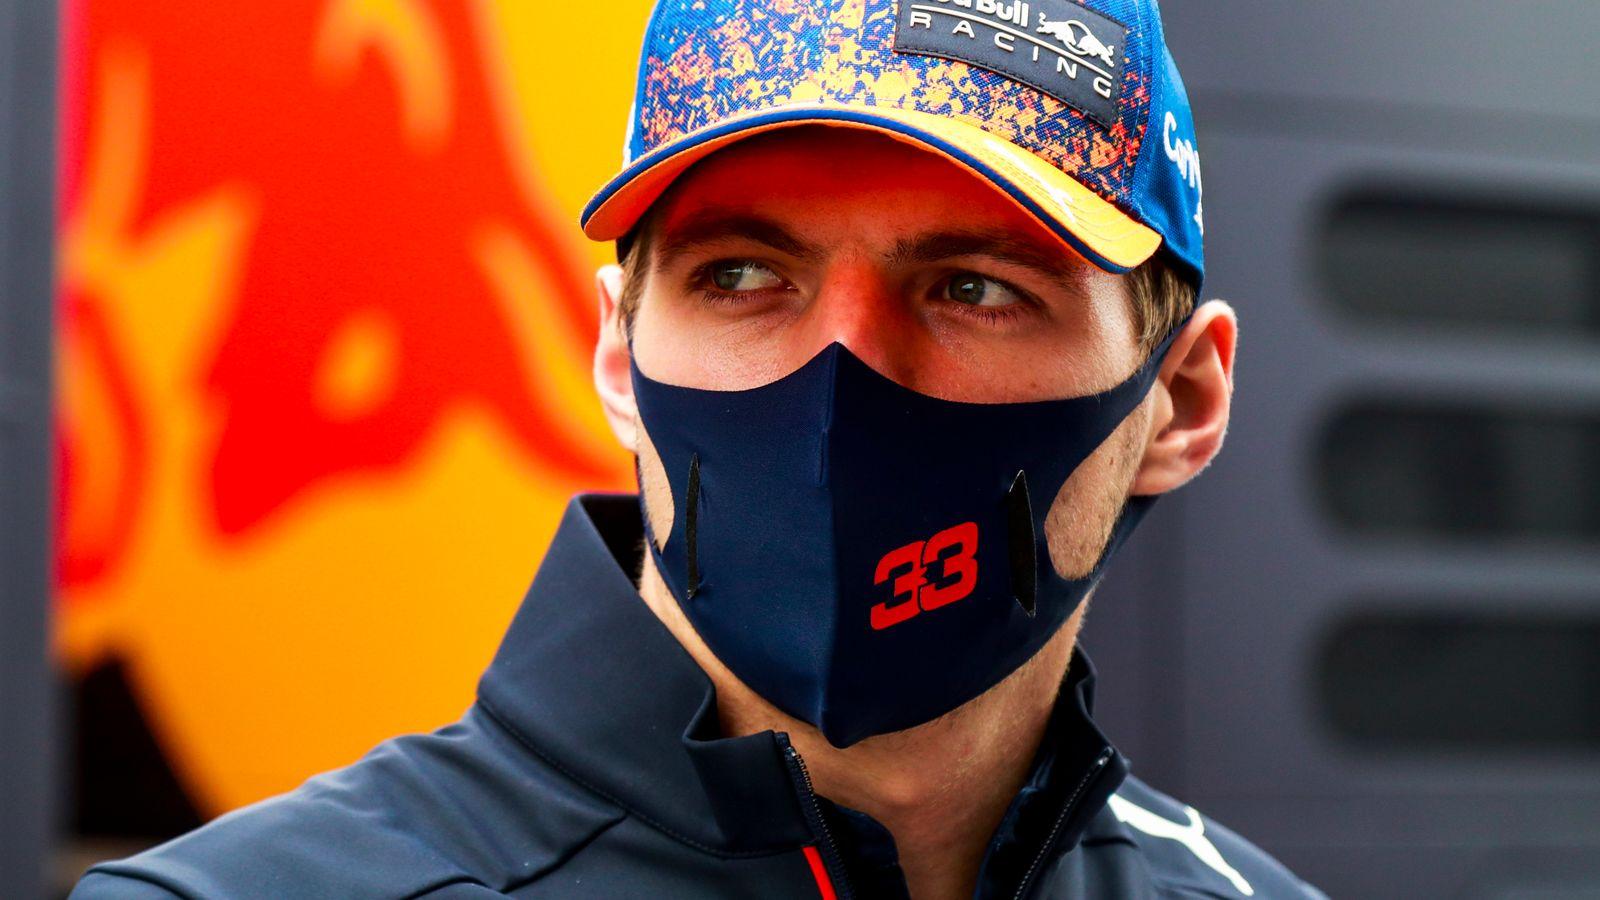 Dutch GP: Max Verstappen urges Lewis Hamilton not to respond to boos as F1  heads to Zandvoort   F1 News